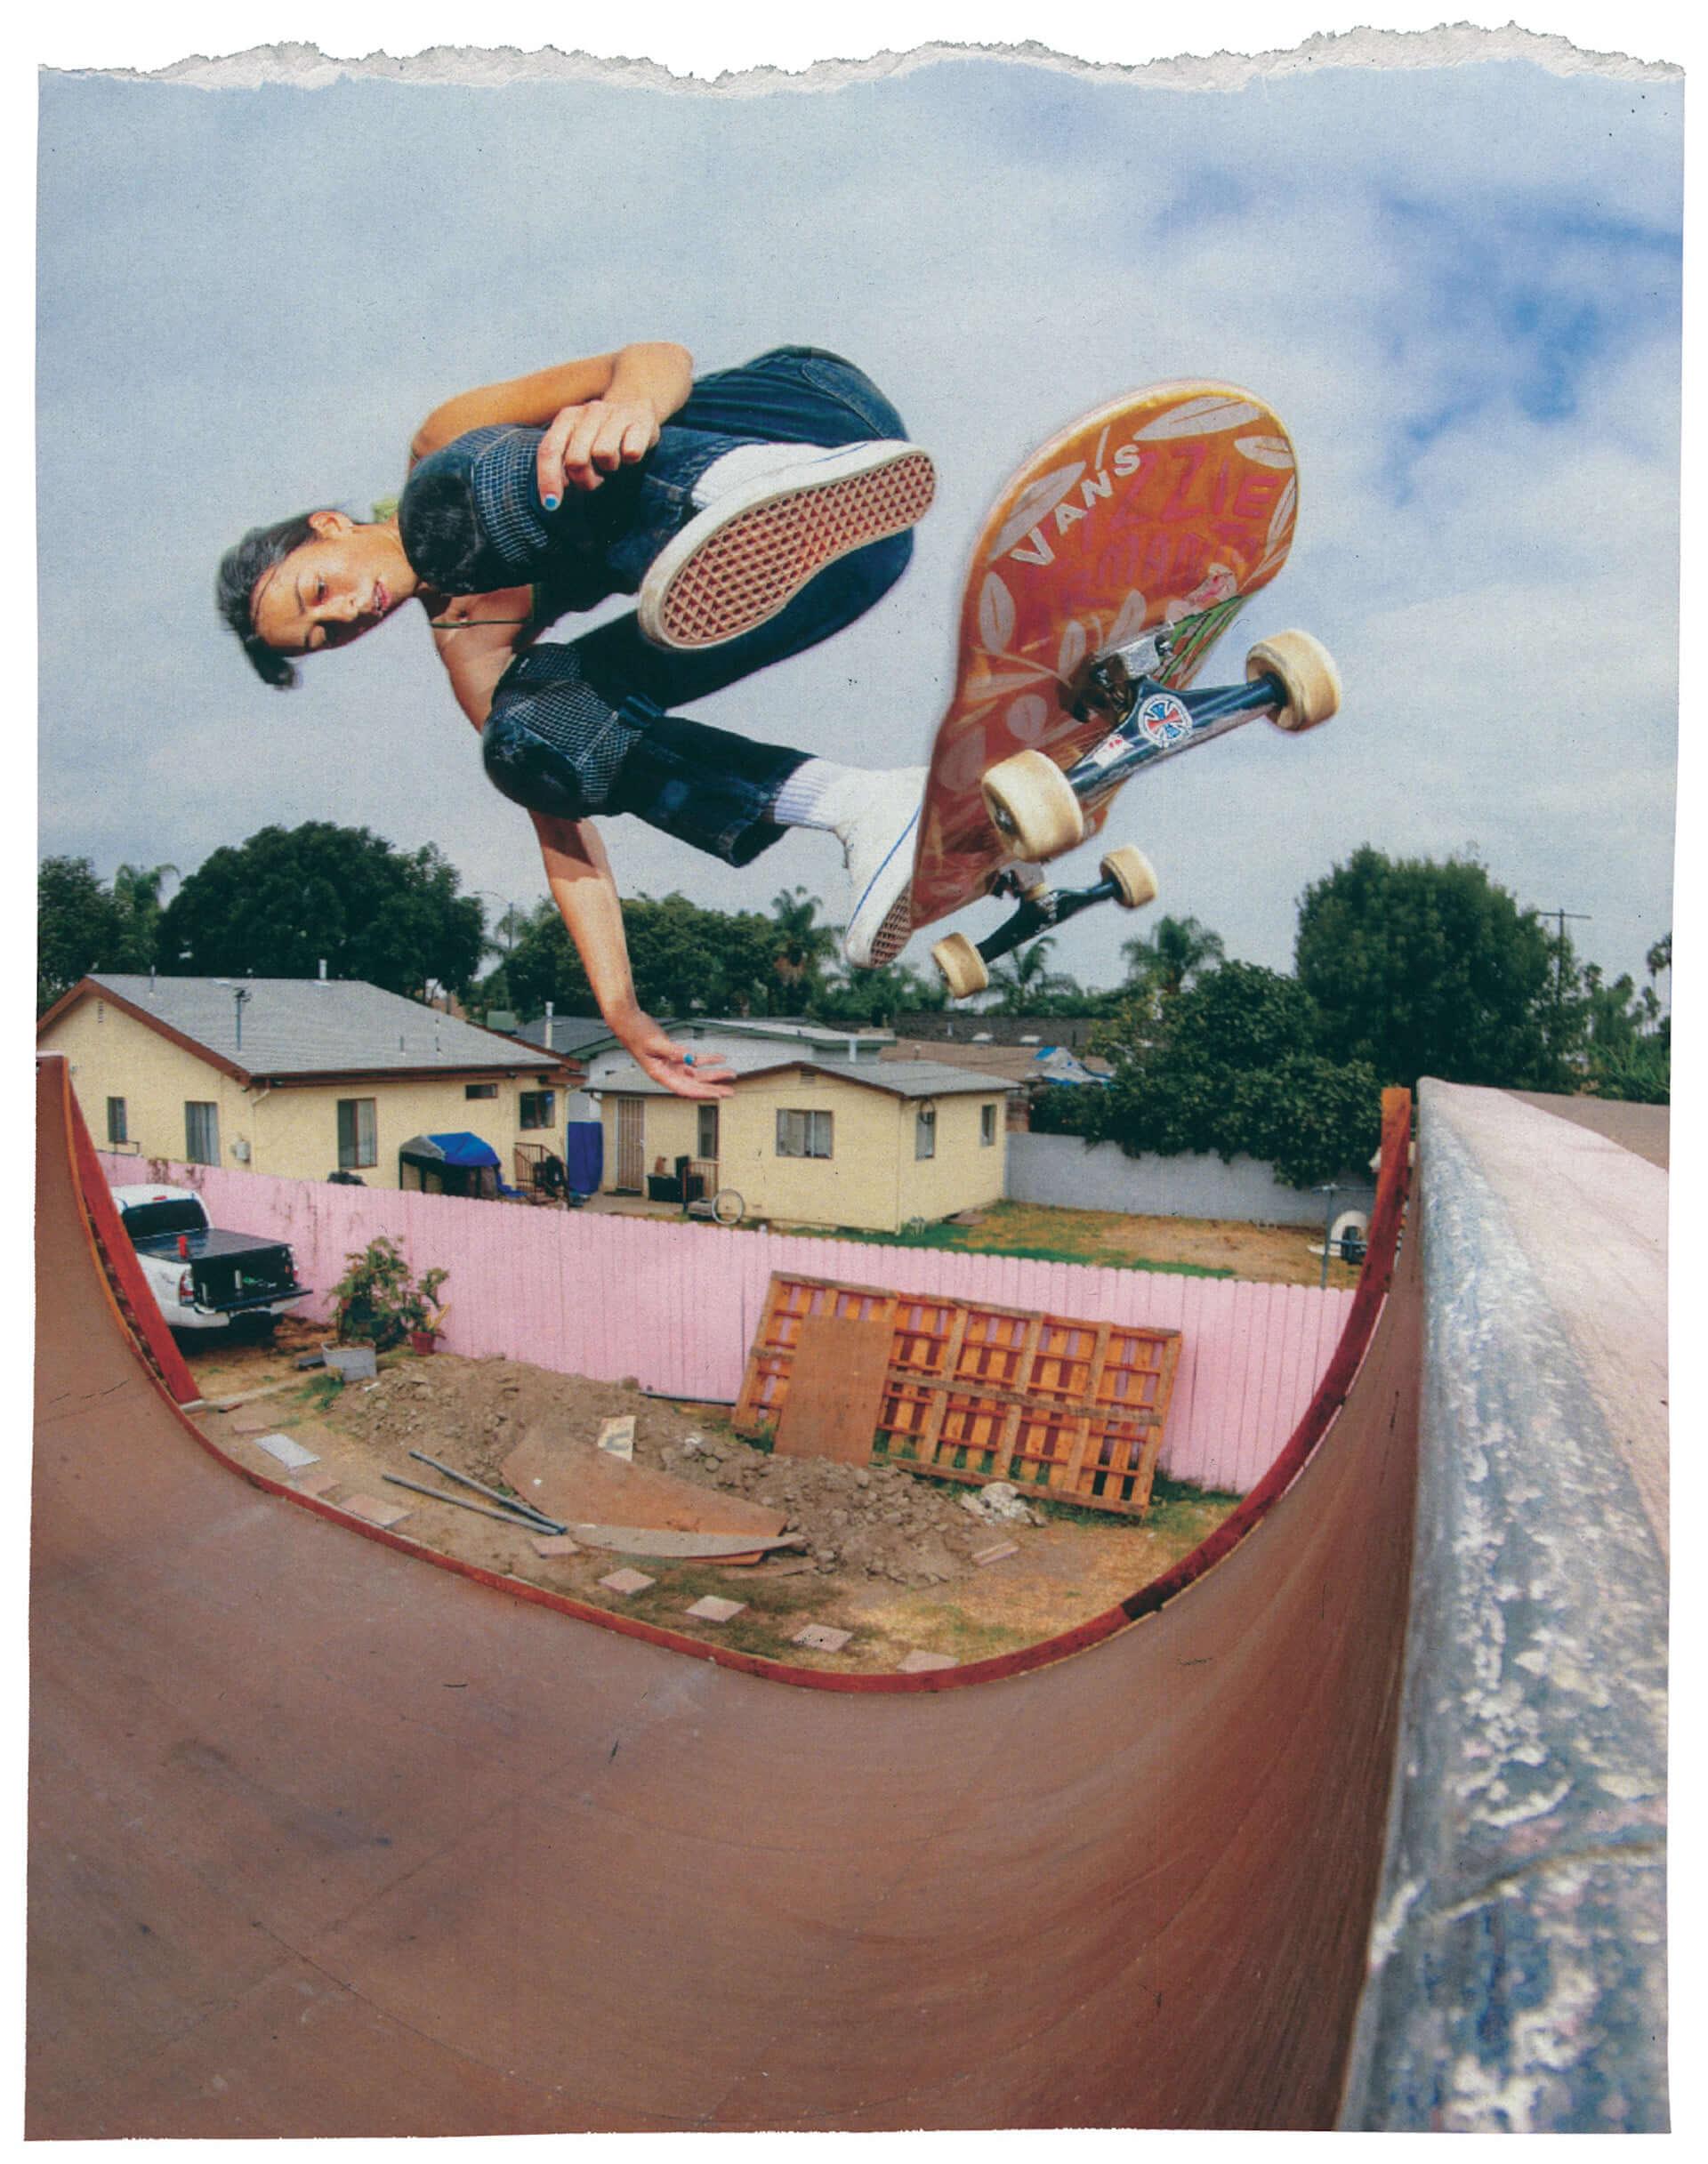 "VANSがスケーターに向けた新コレクション「Skate Classics」を発表!""全てが新しくなった""素材・構造に注目 lf210304_vans_3-1920x2433"